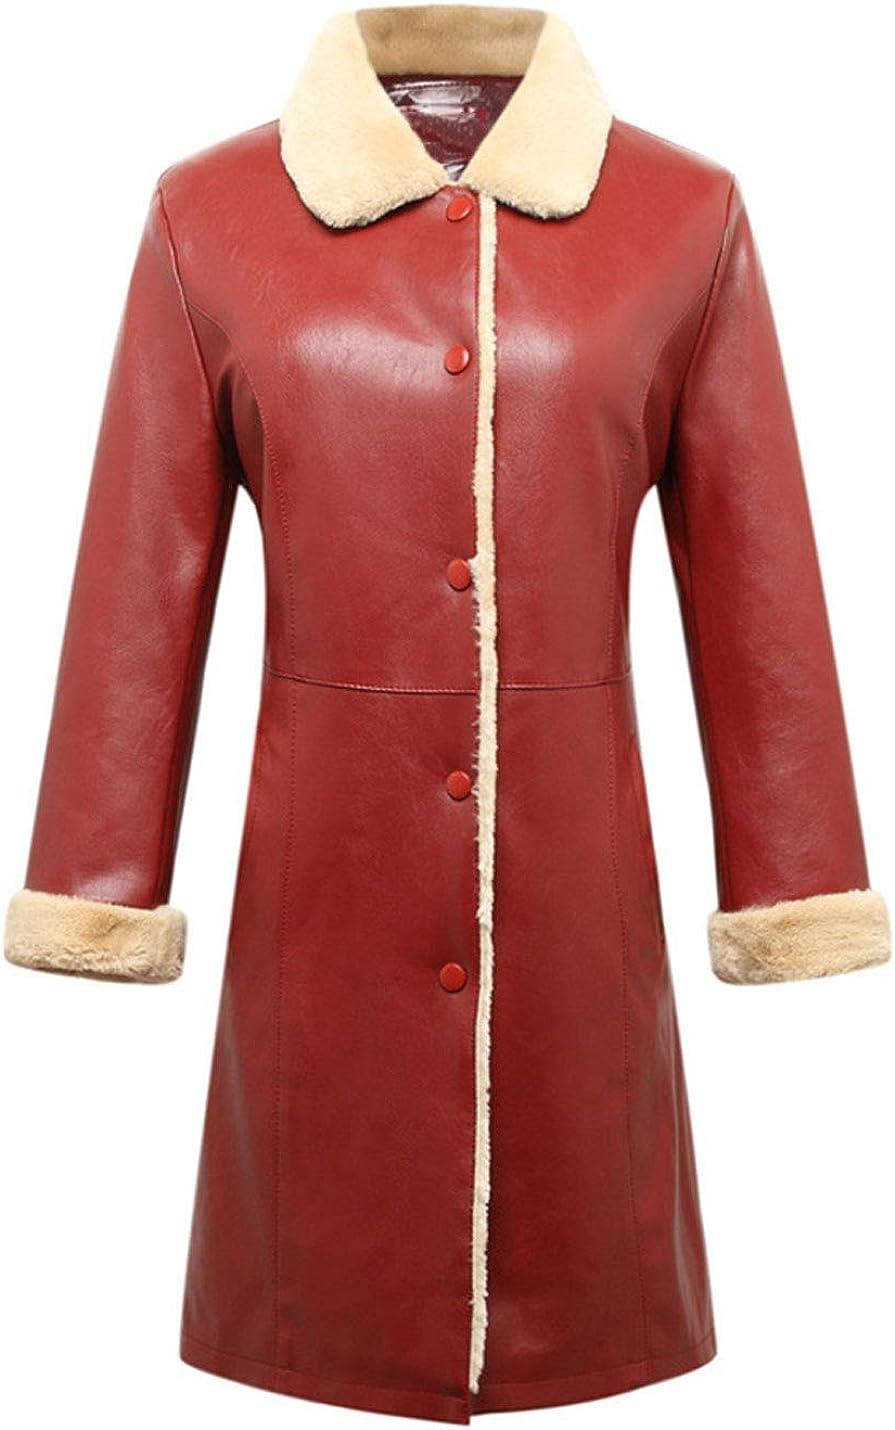 Lentta Womens Casual Mid Long Fleece Lined Faux PU Leather Shearling Jacket Coats